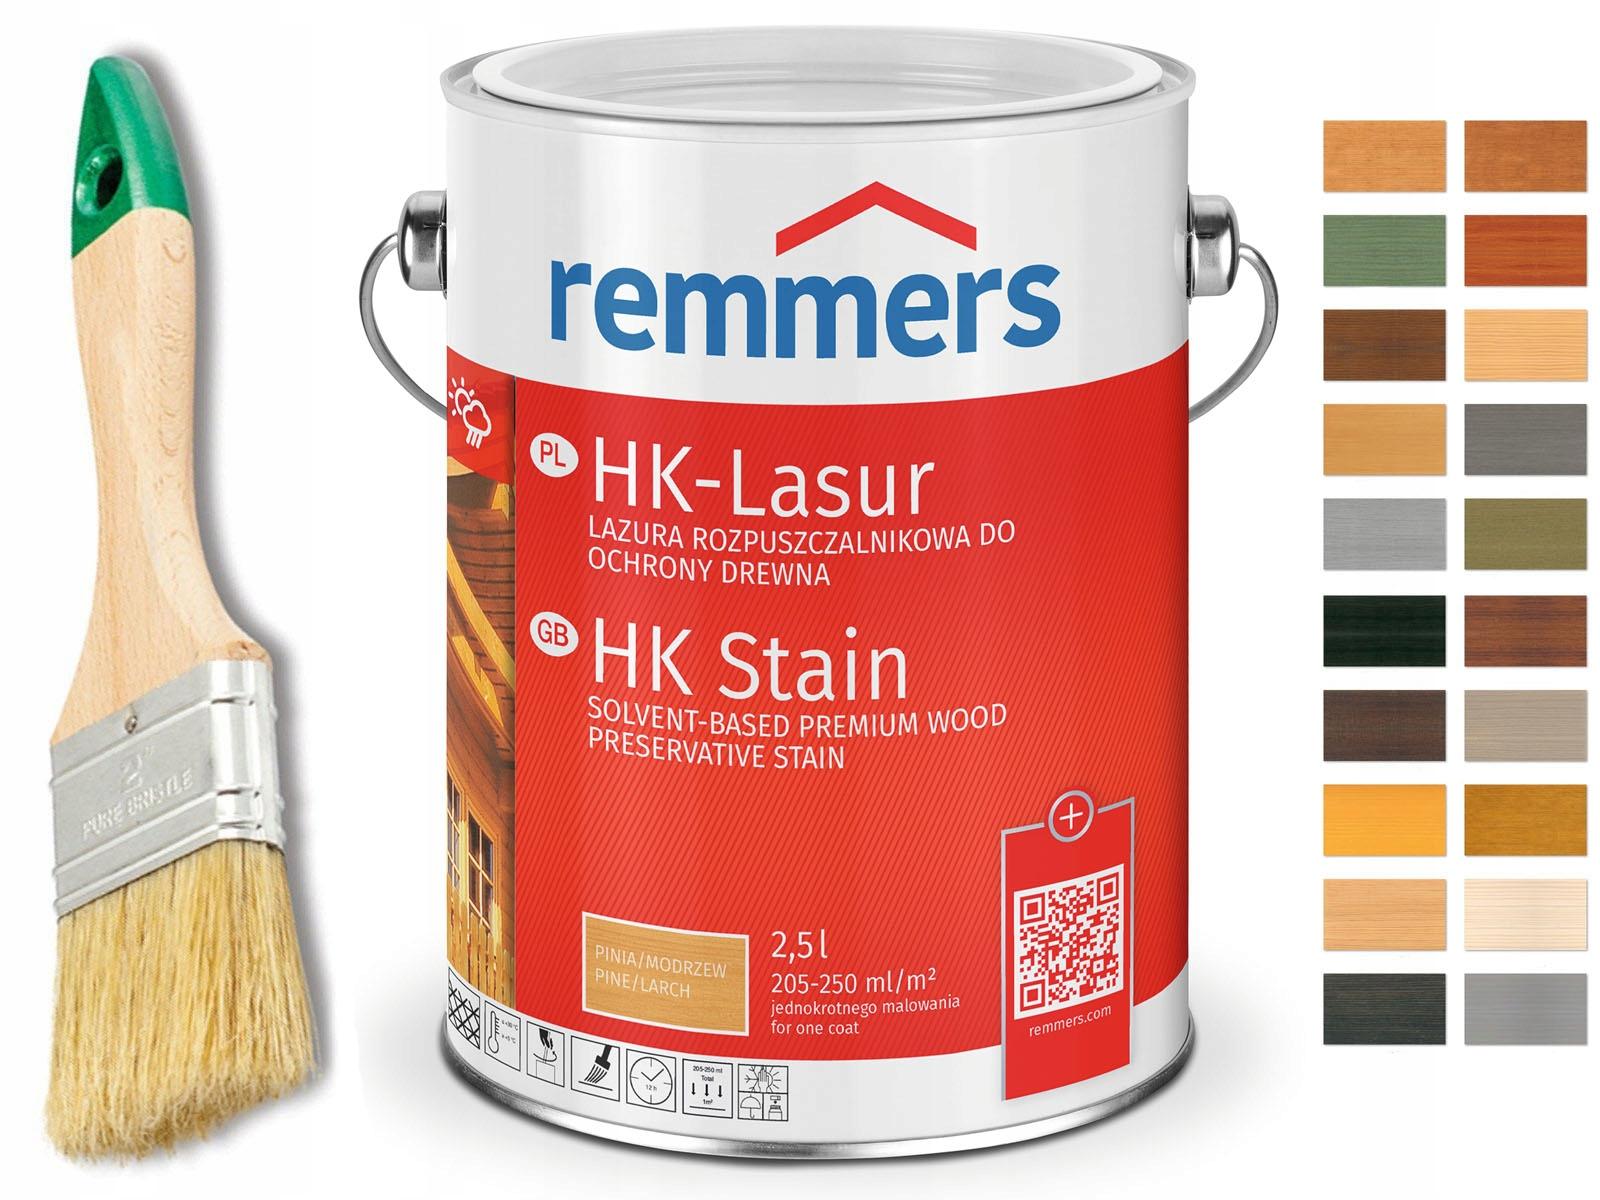 Remmers HK-Lasur-пропитка для дерева 10Л ЦВЕТА